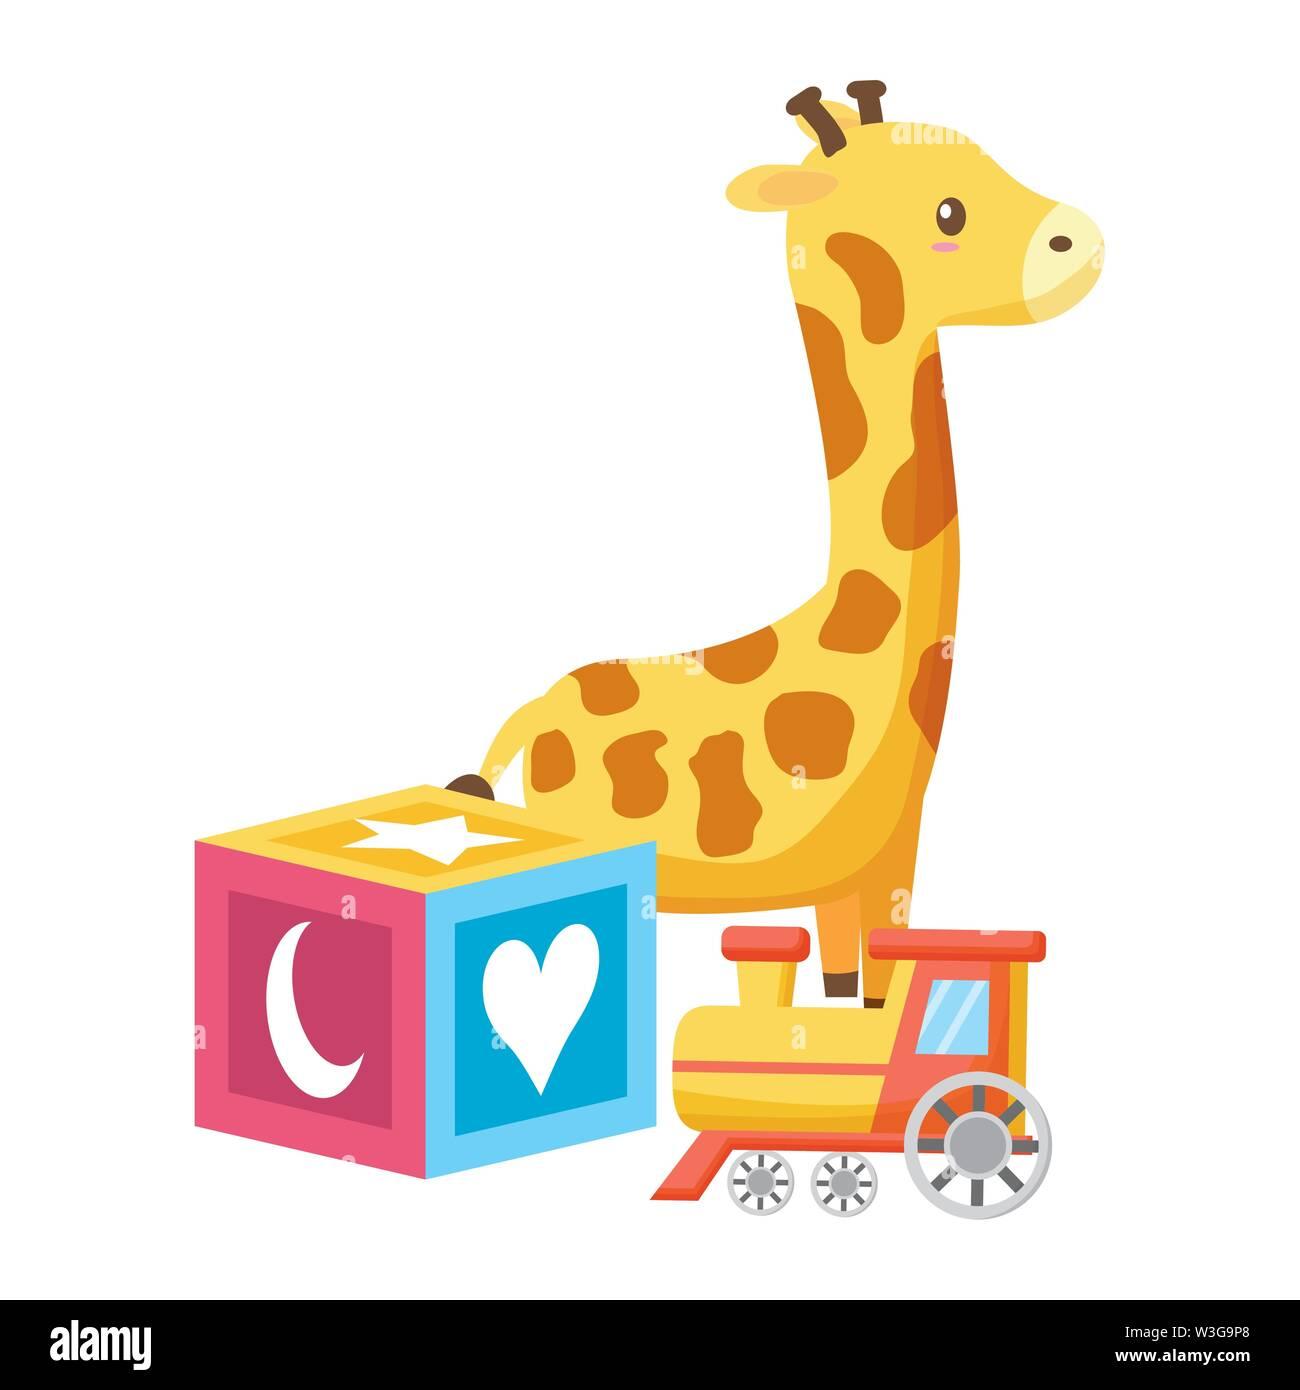 baby toys giraffe cube and train vector illustration - Stock Image